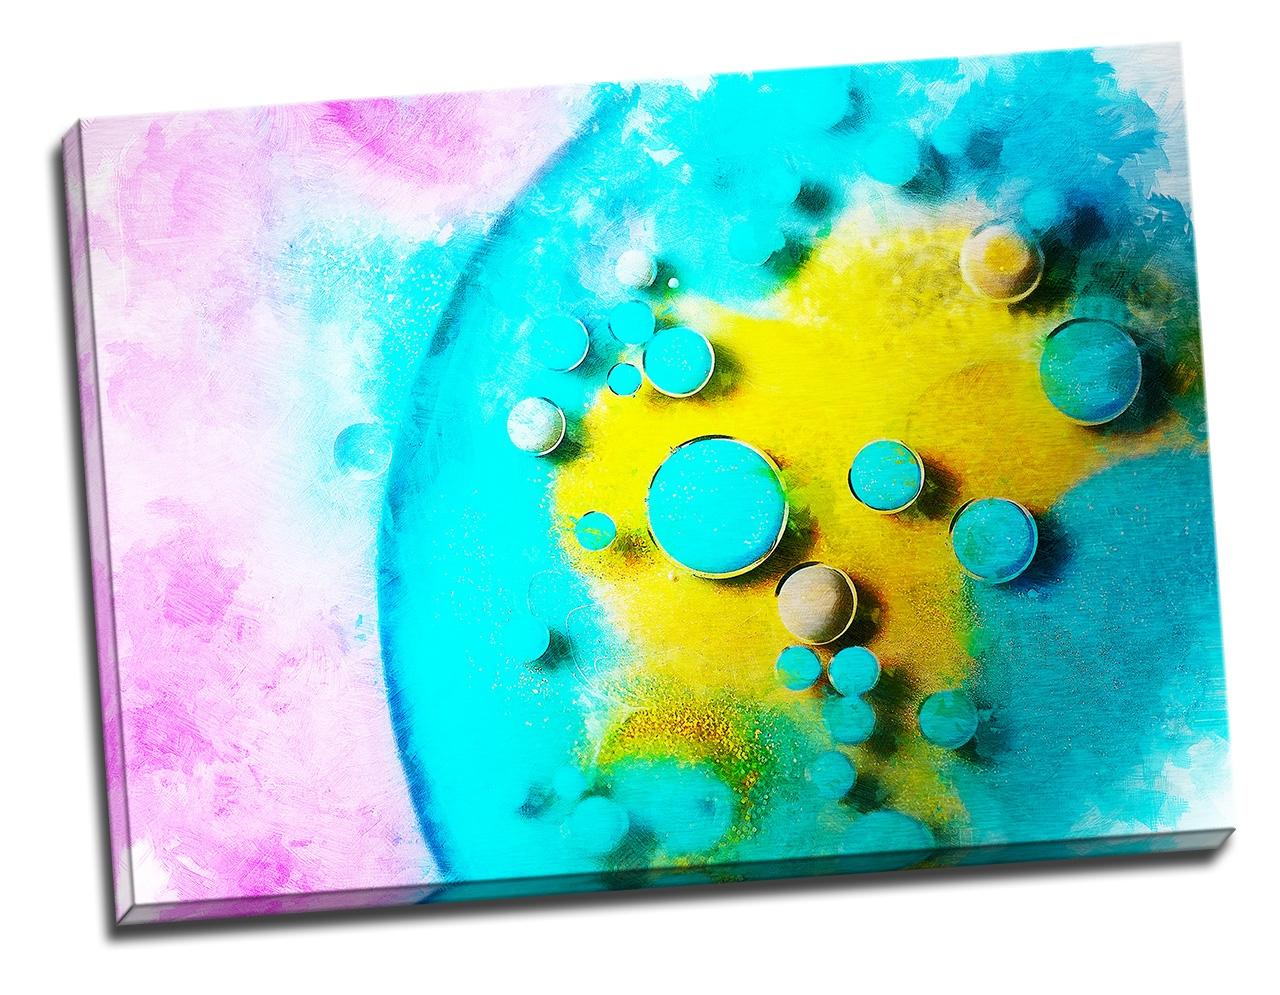 Tablou din aluminiu striat Bubbles of Joy